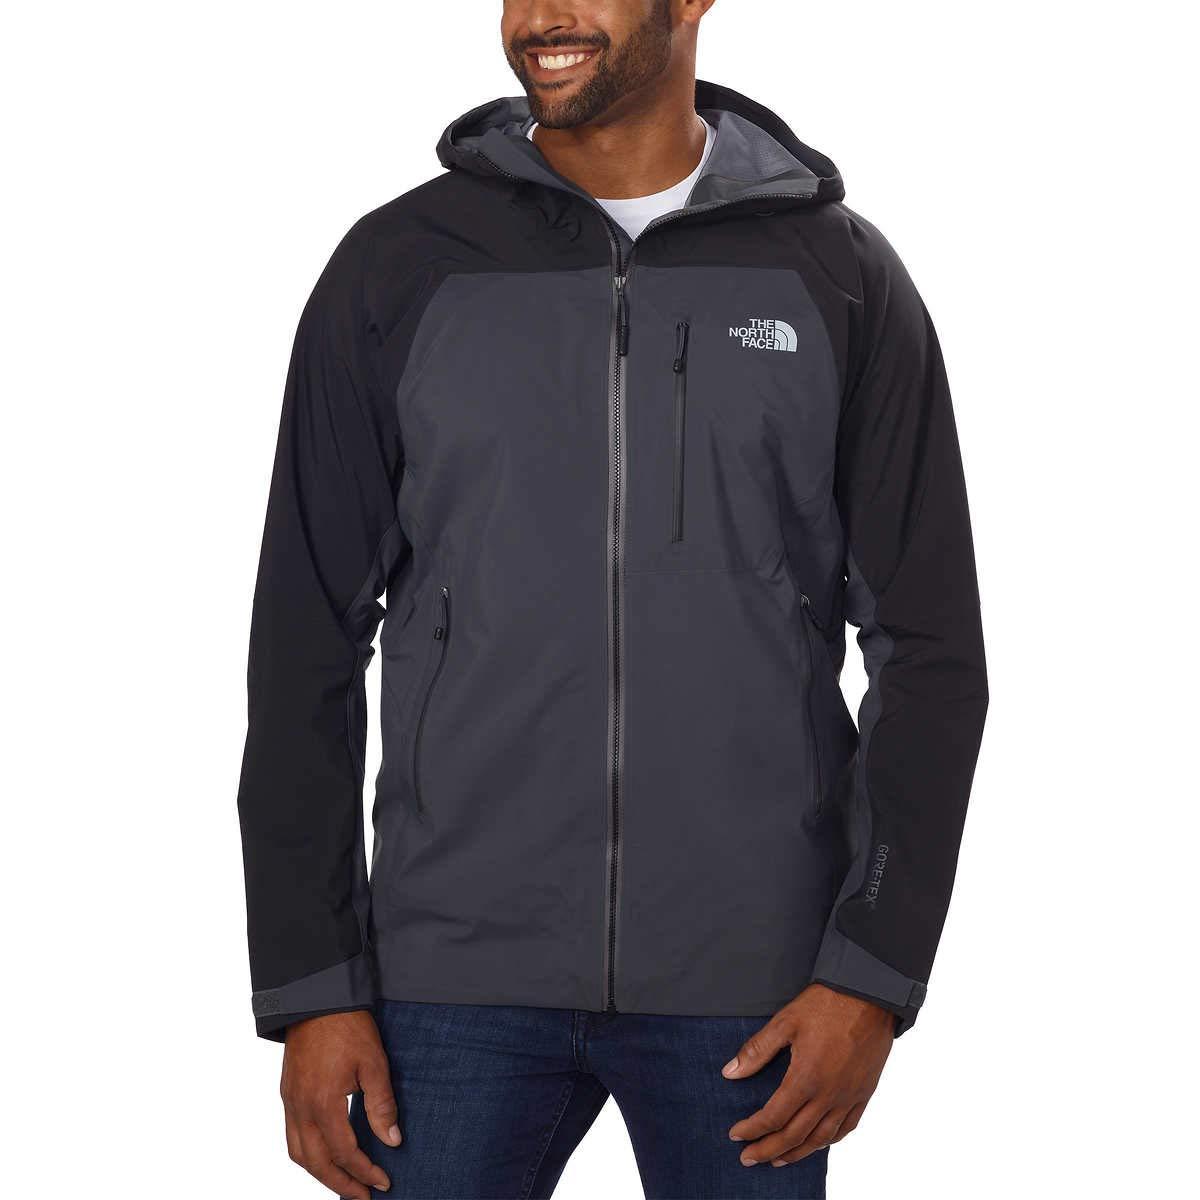 0bb6f8d64 The North Face Men's Zero Gully Jacket, Variety at Amazon Men's ...